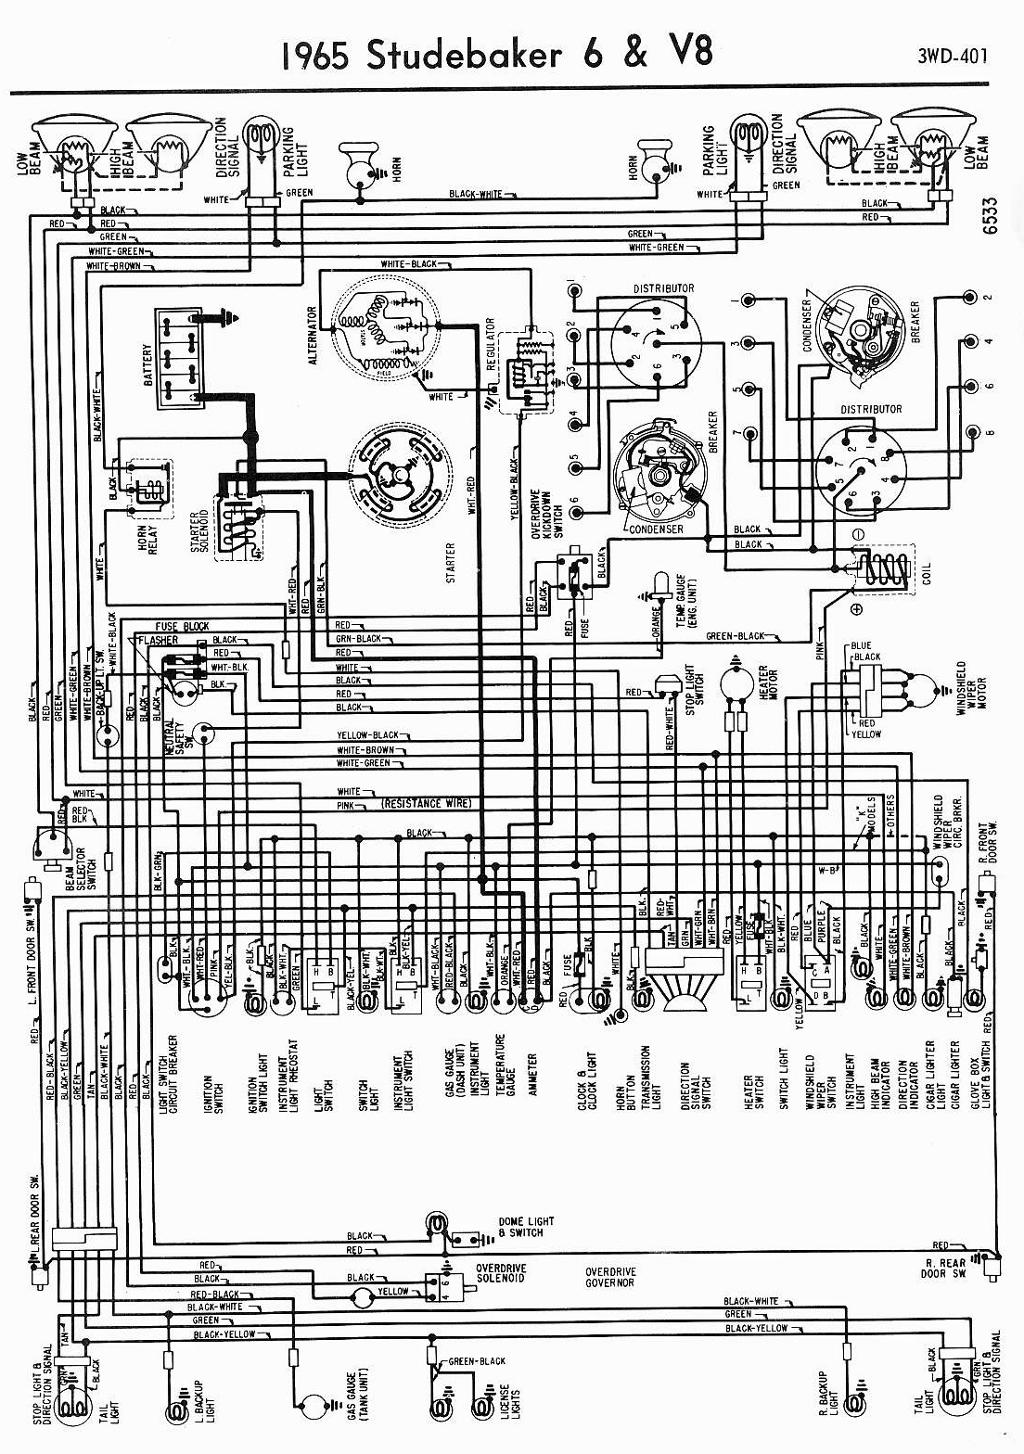 Triumph America Wiring Harness Explained Diagrams Studebaker Diagram Spitfire Mk1 Trusted Baja